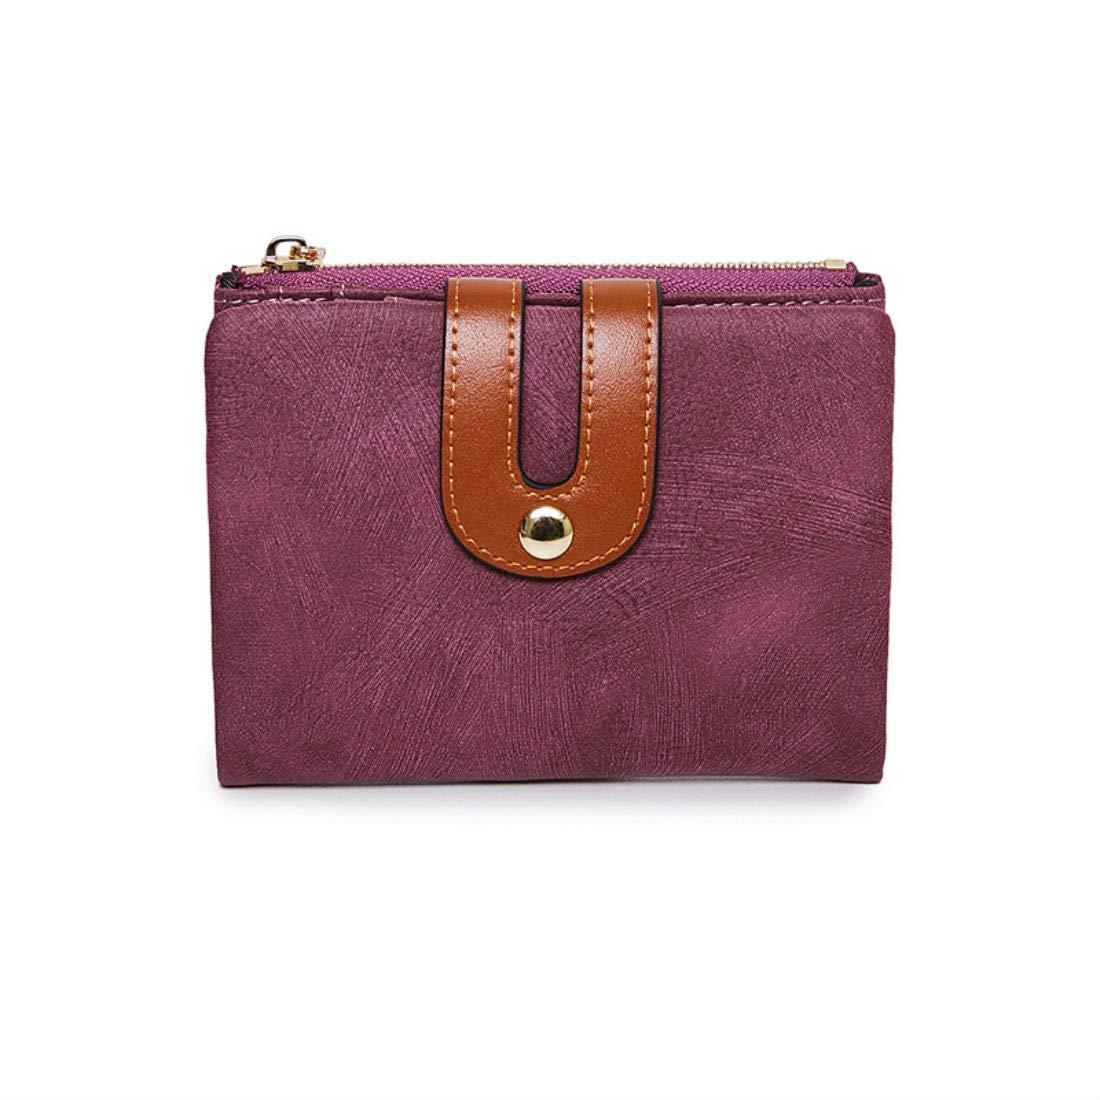 Women's Small Wallet Bifold Soft Leather Thin Short Wallets RFID Blocking Ladies Mini Purse with ID Window (Purple)